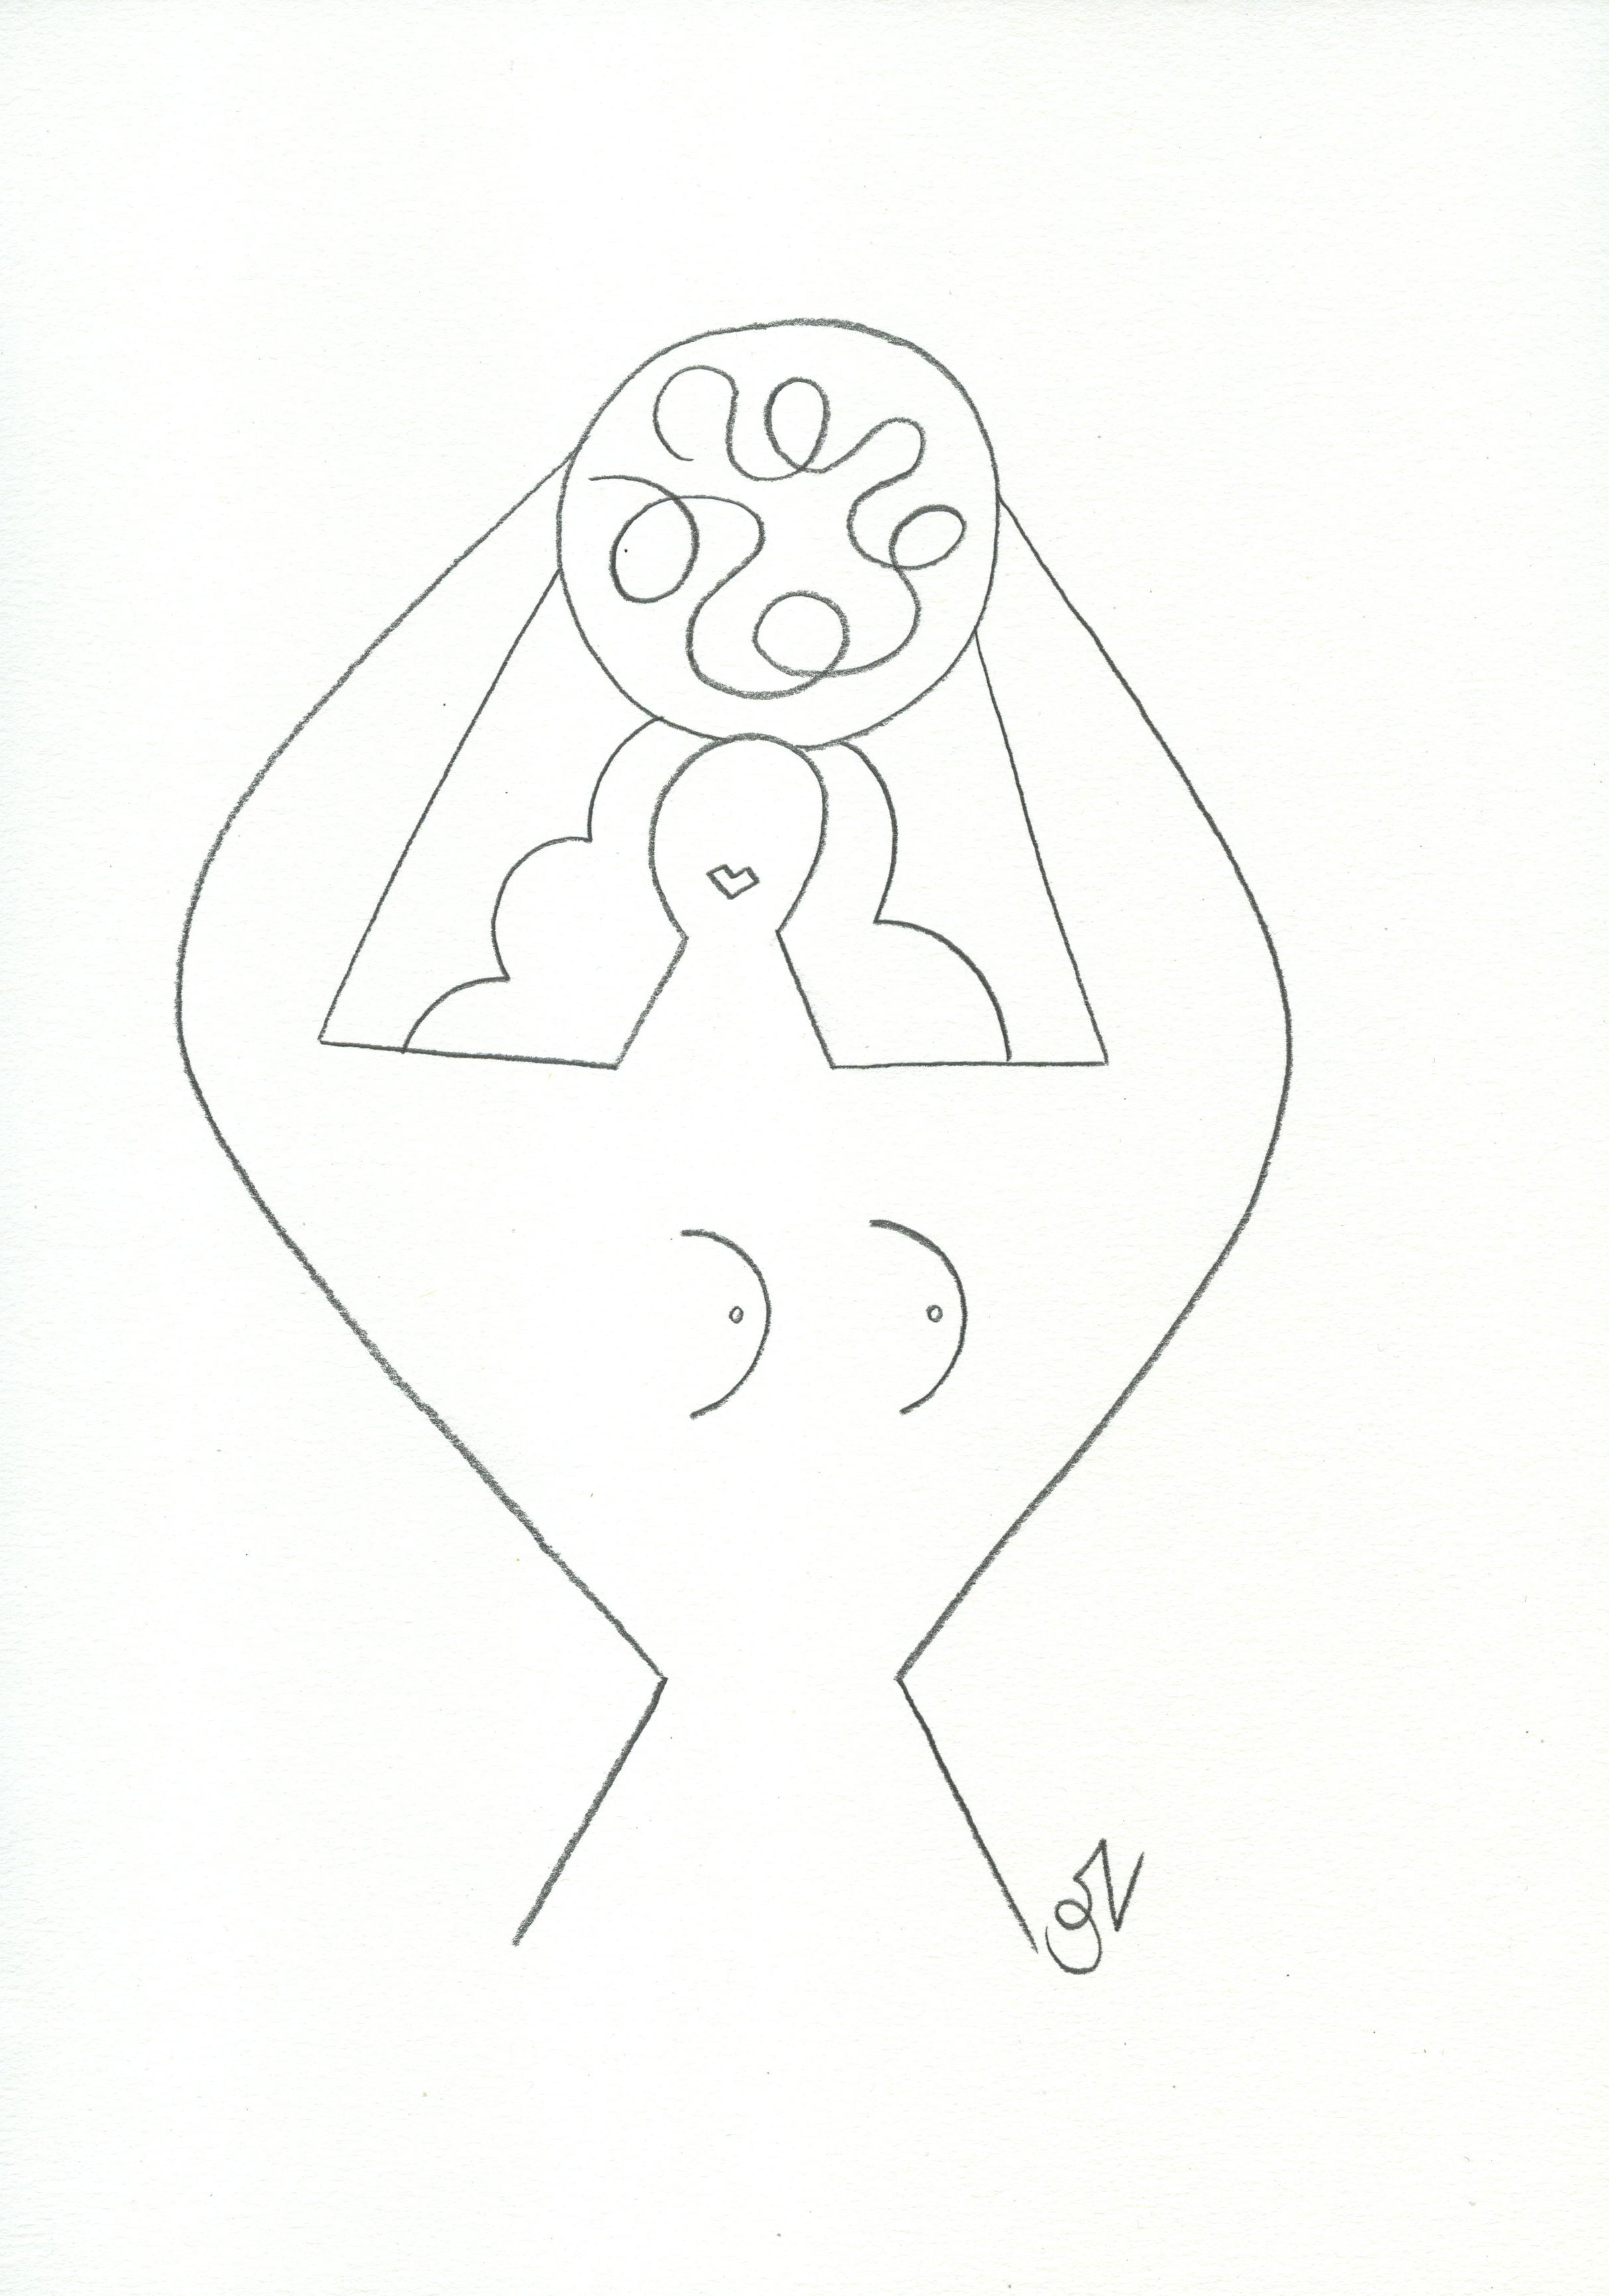 Olimpia Zagnoli, How to eat spaghetti like a lady2, 2017, pencil on paper, 29×21 cm